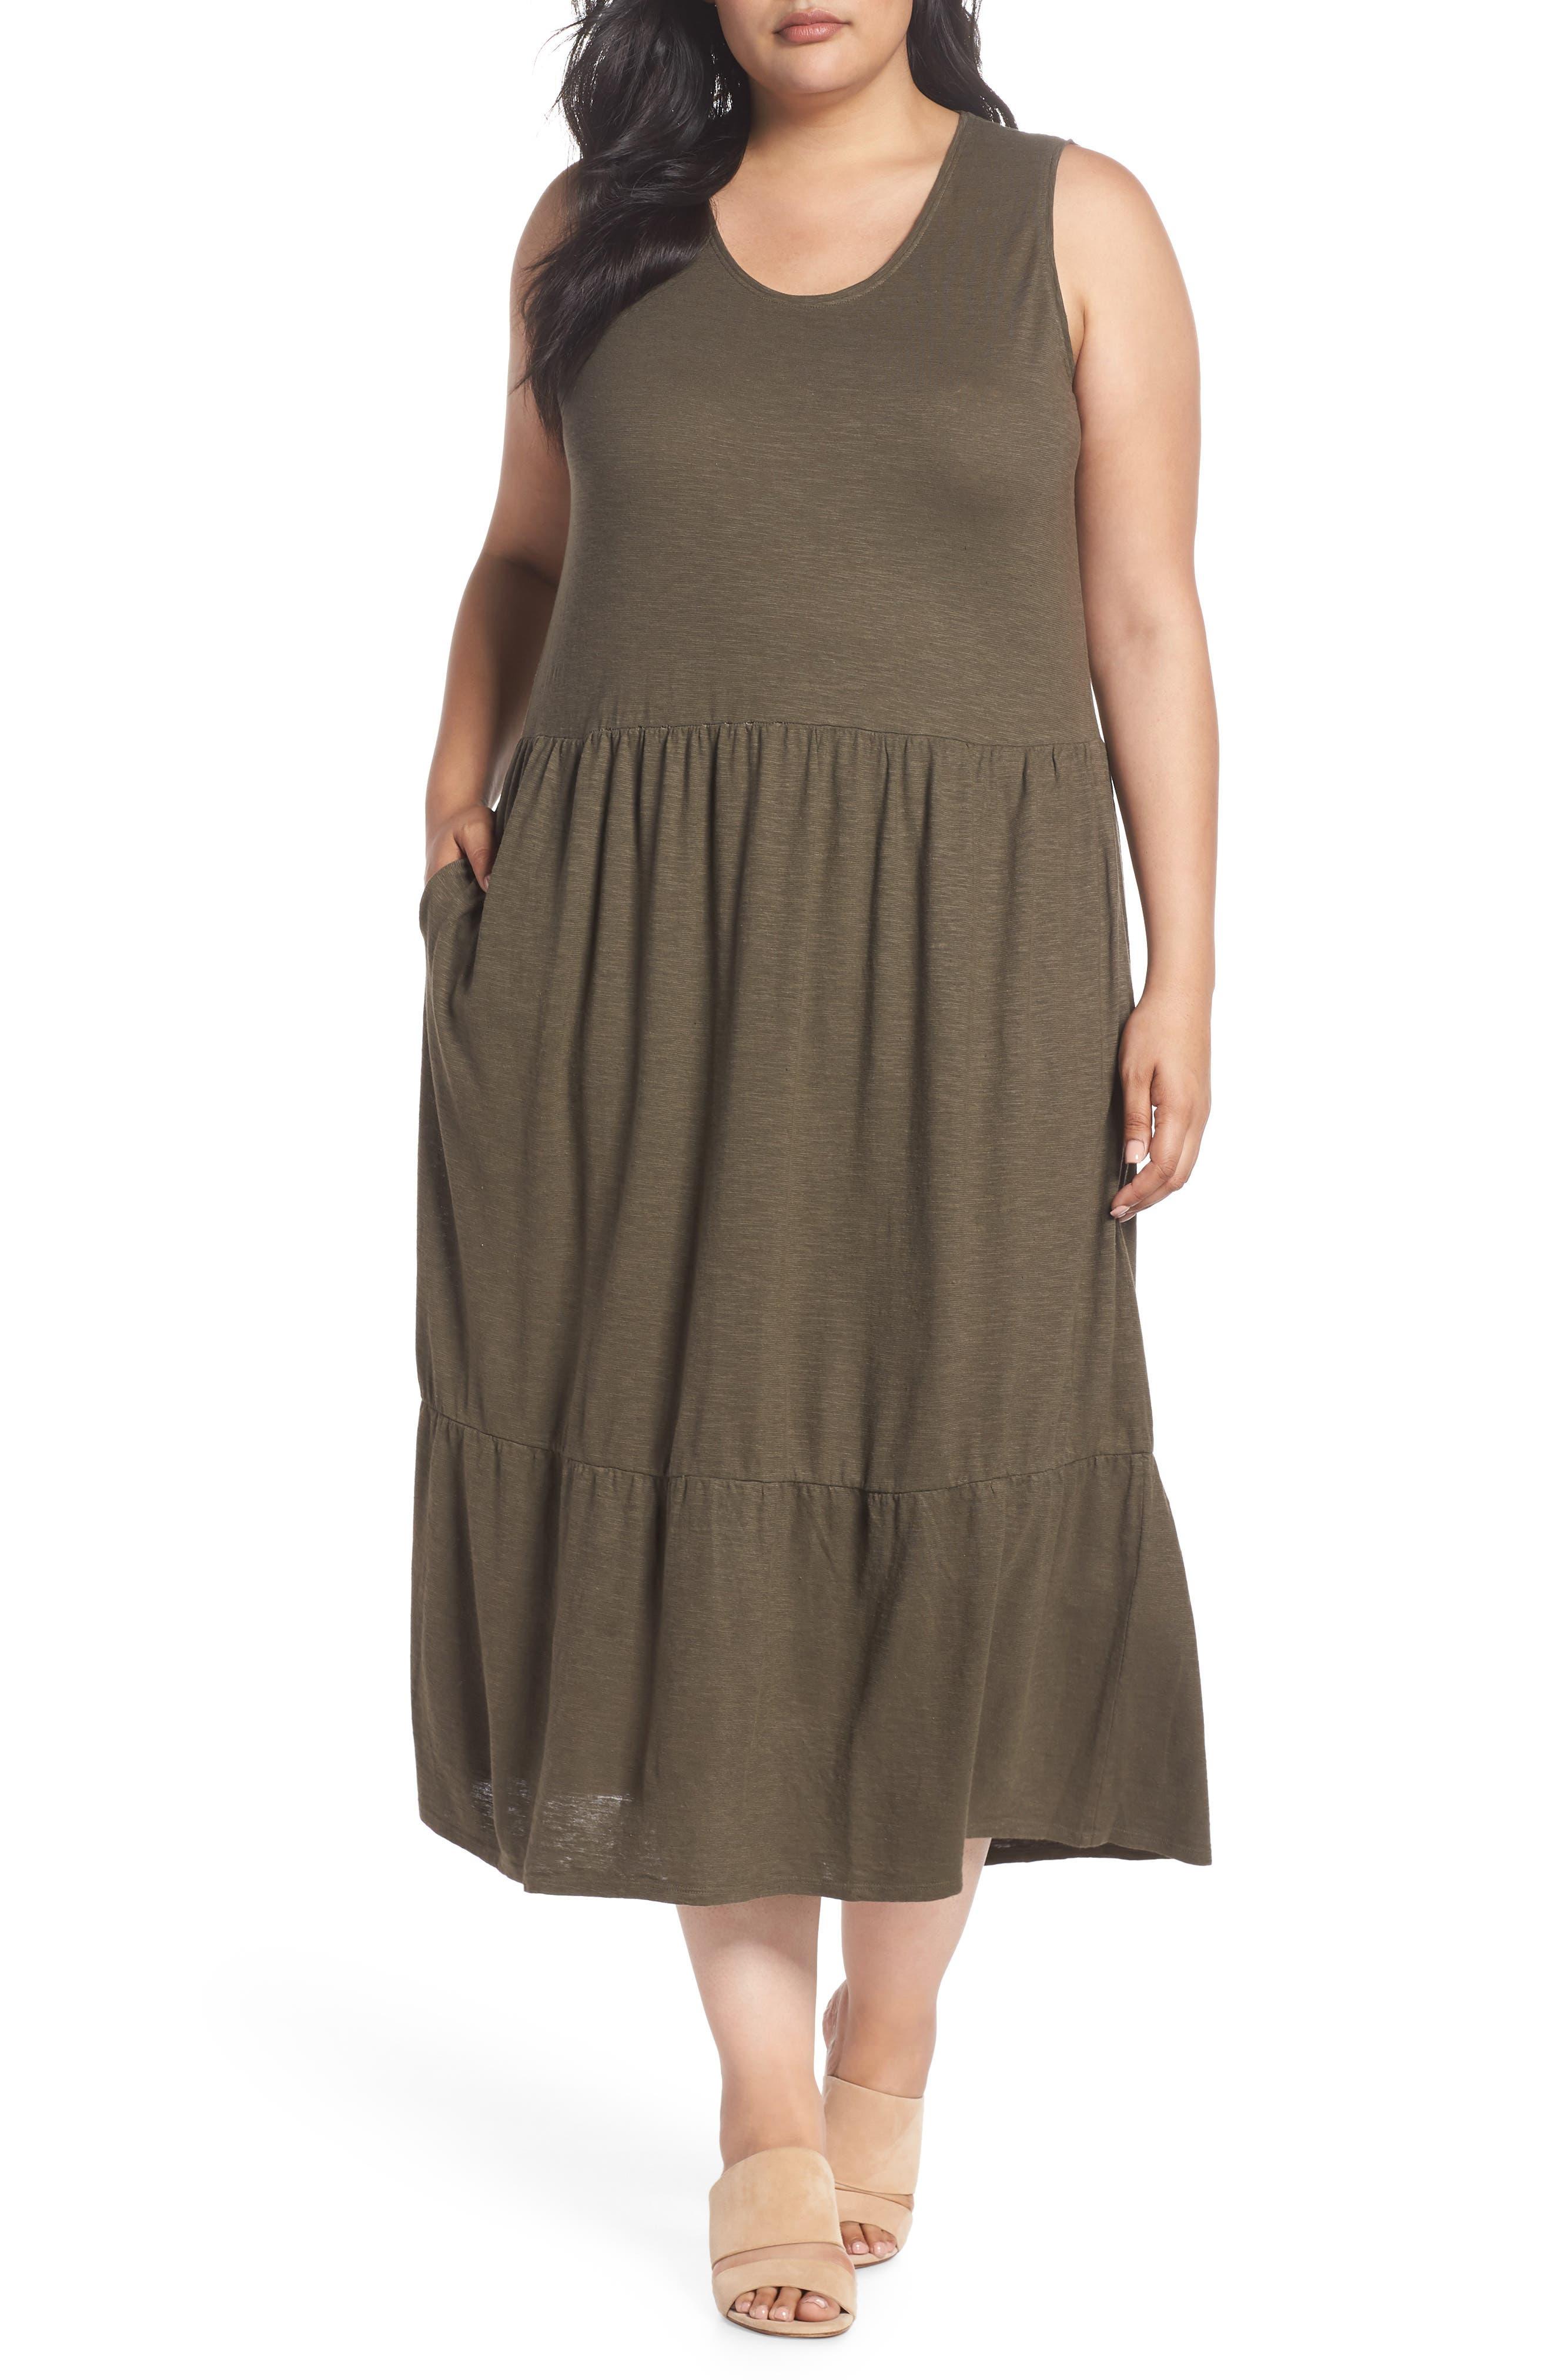 Scooped Neck Hemp & Cotton Midi Dress,                             Main thumbnail 1, color,                             359